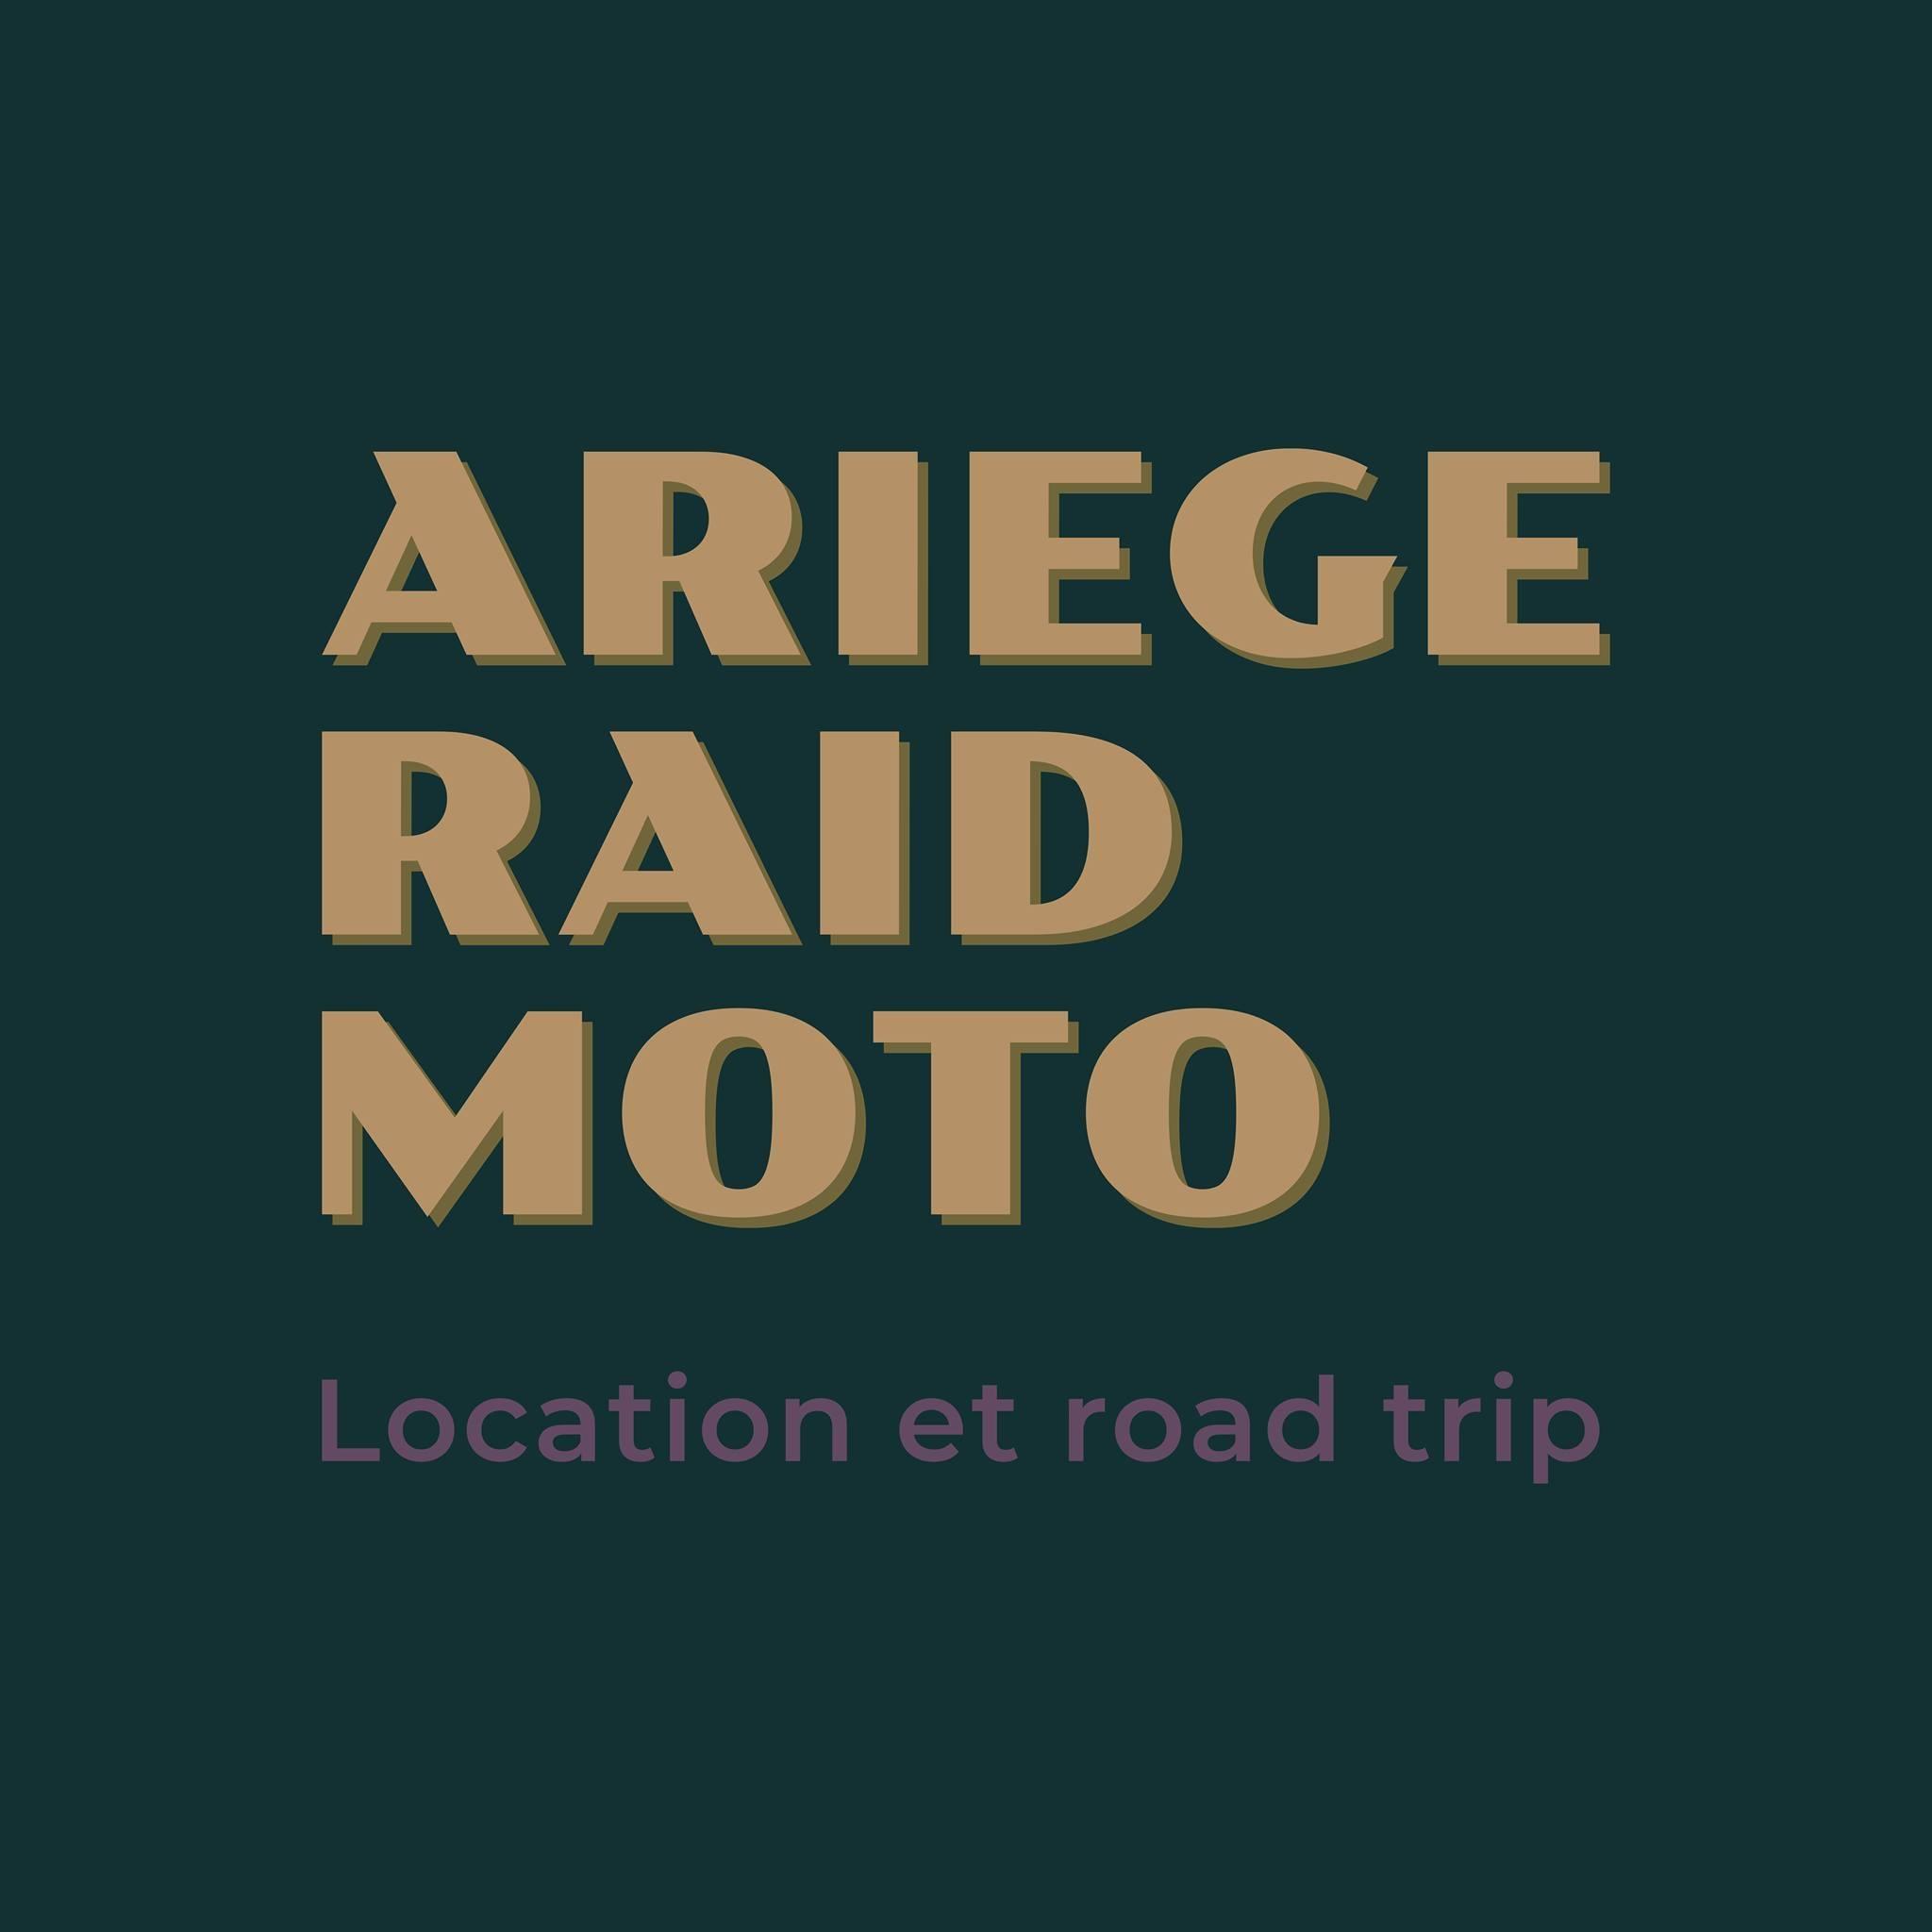 ariege raid moto